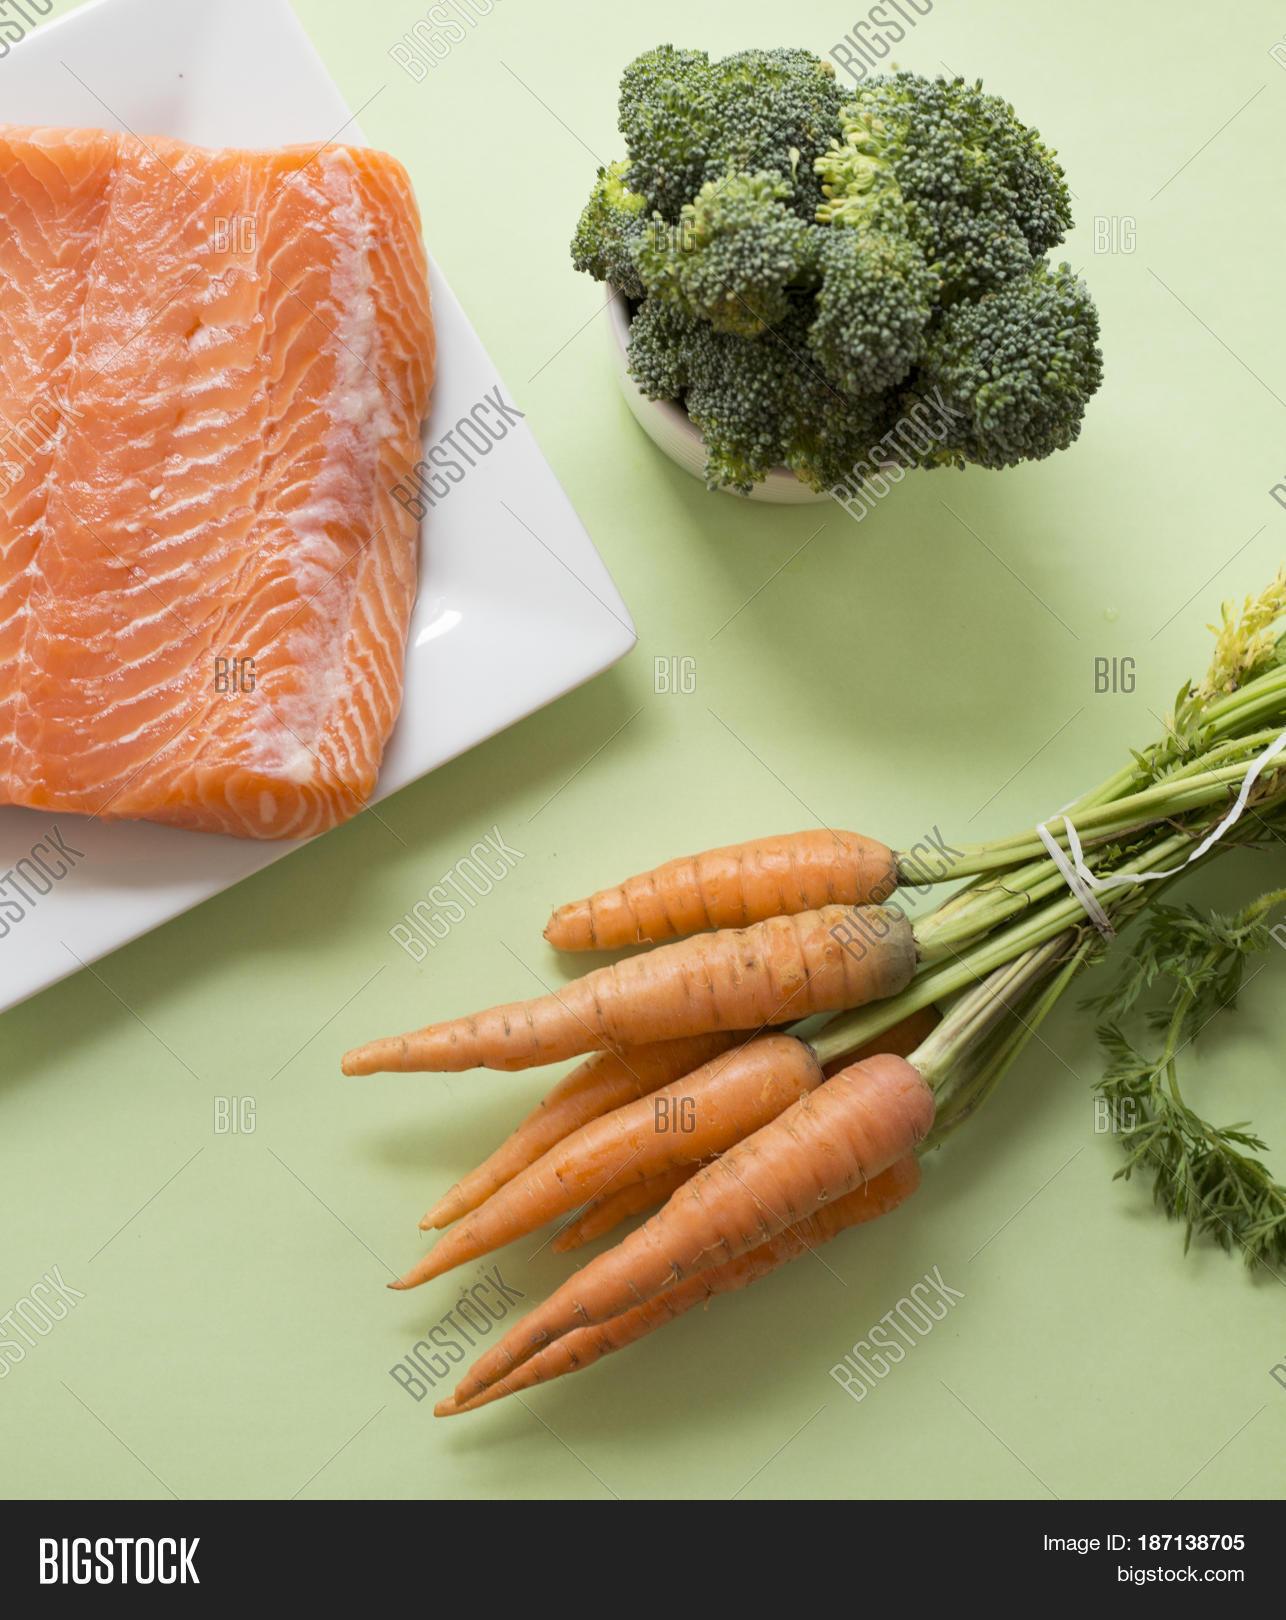 how to make salmon fish steak